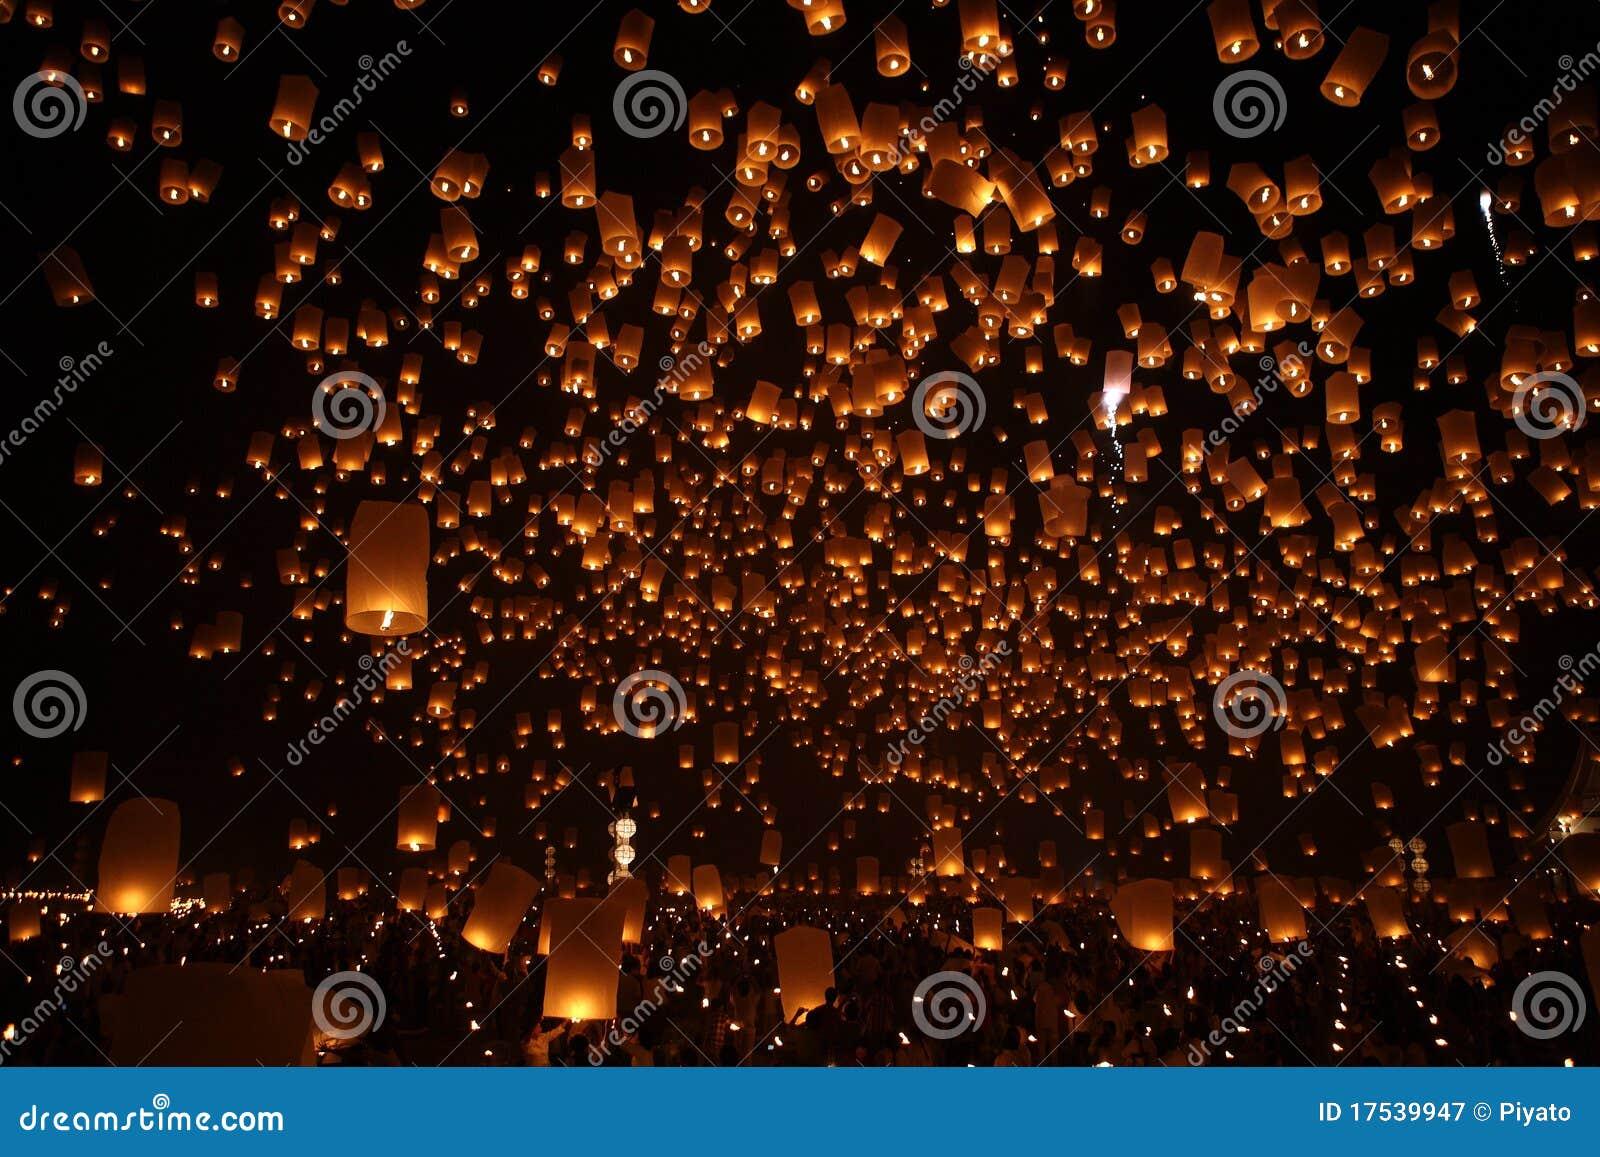 happy newyear christmas balloon traditional night